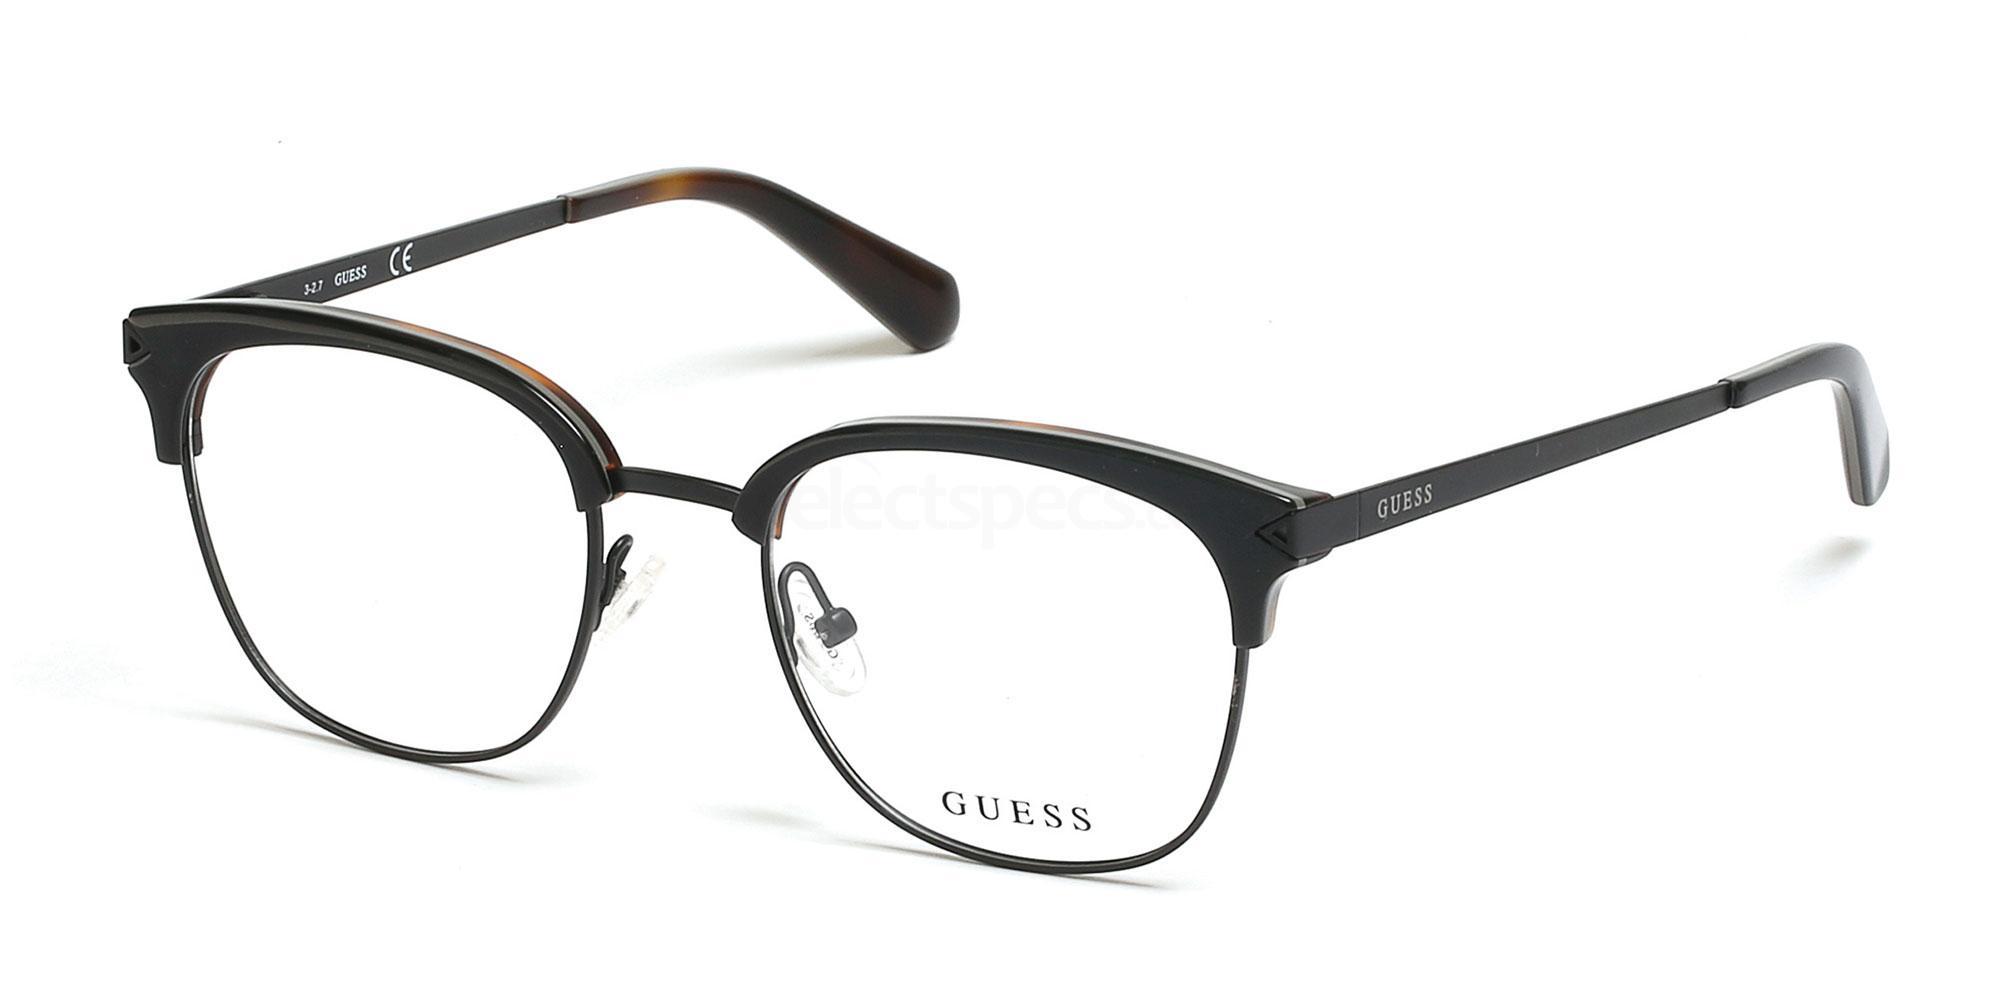 005 GU1955 Glasses, Guess